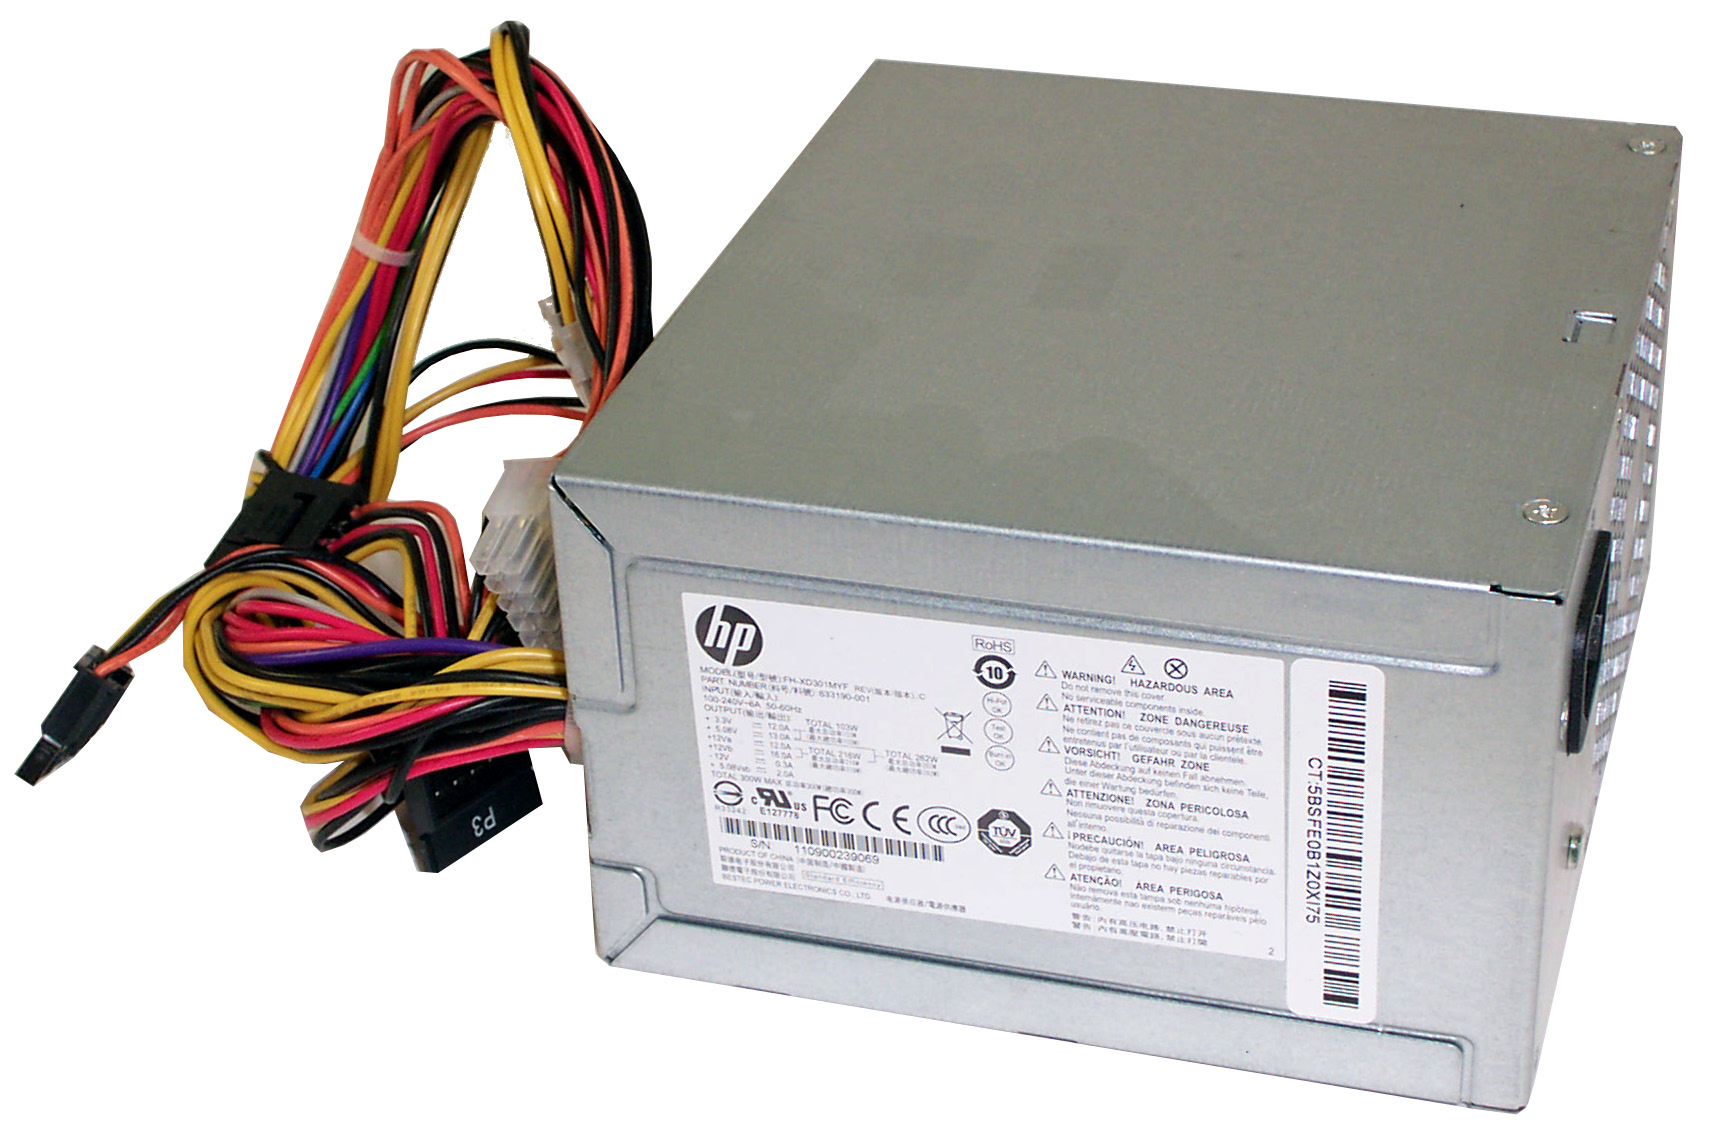 633190-001 Hewlett Packard 300W 24 Pin ATX Power Supply Unit- Bestec FH-XD301MYF